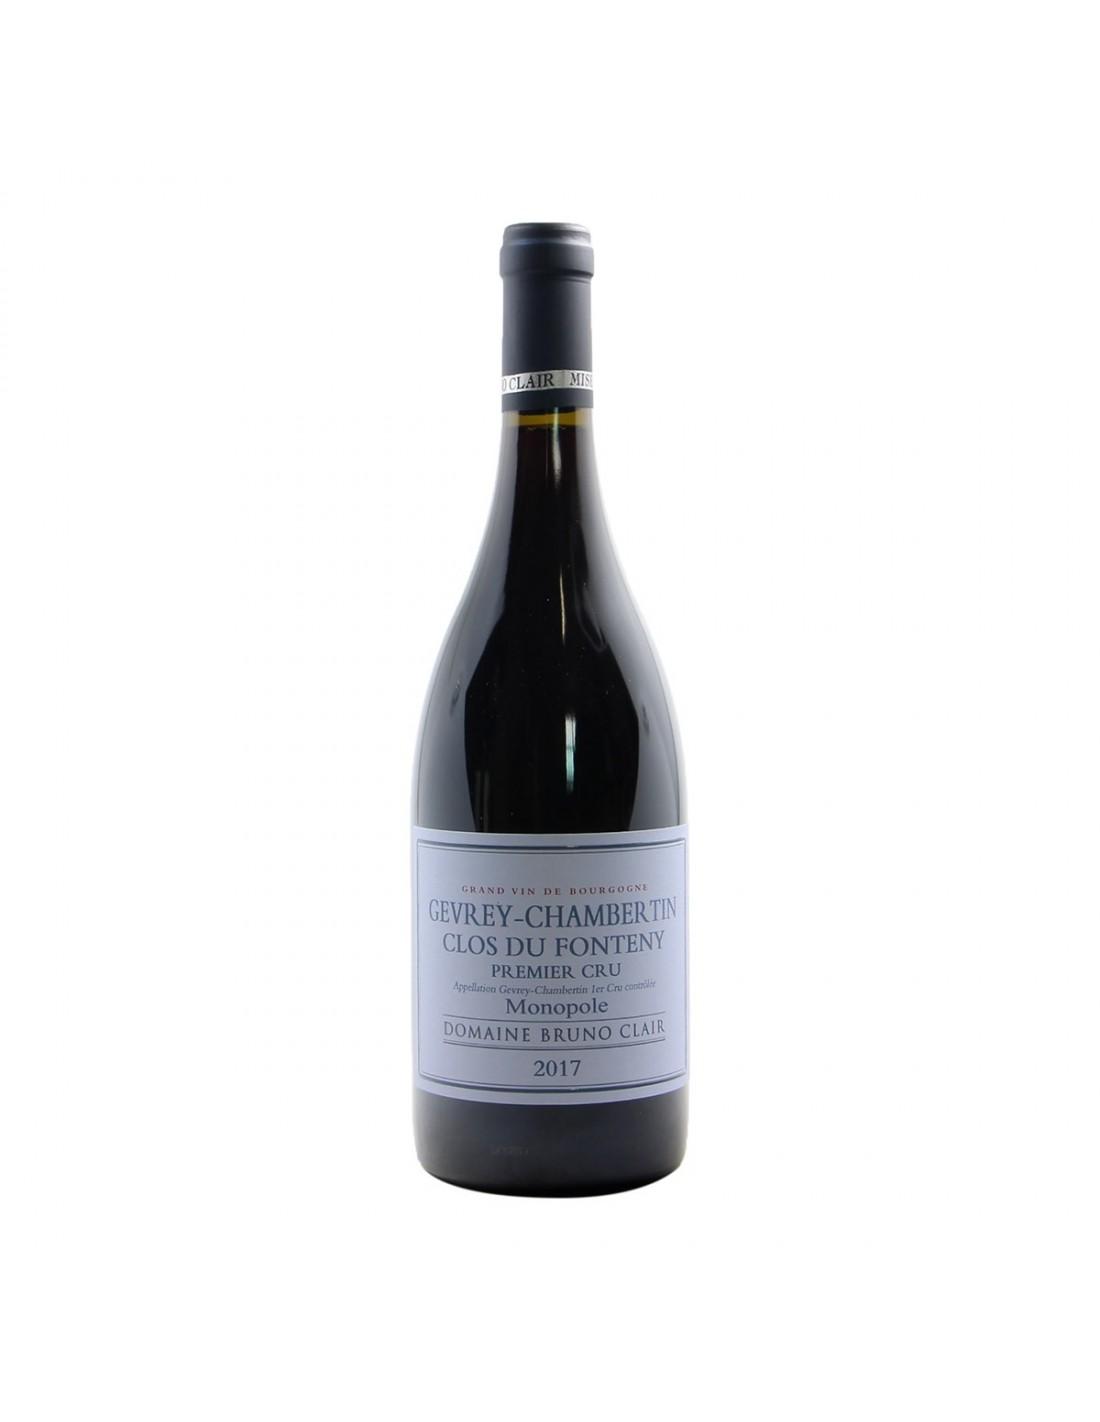 Bruno Clair Gevrey Chambertin 1er Cru Clos du Fonteny Monopole 2017 Grandi Bottiglie